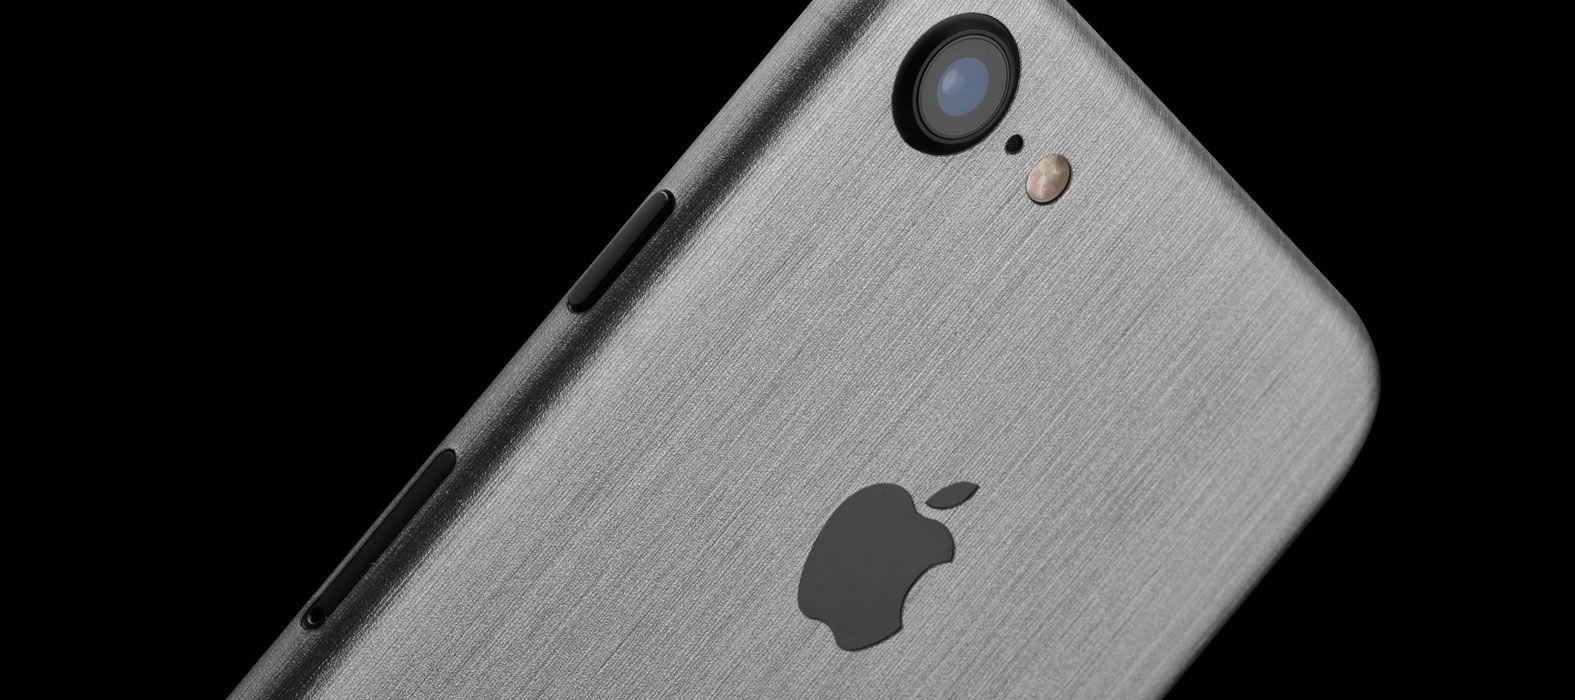 iPhone 7 Skins